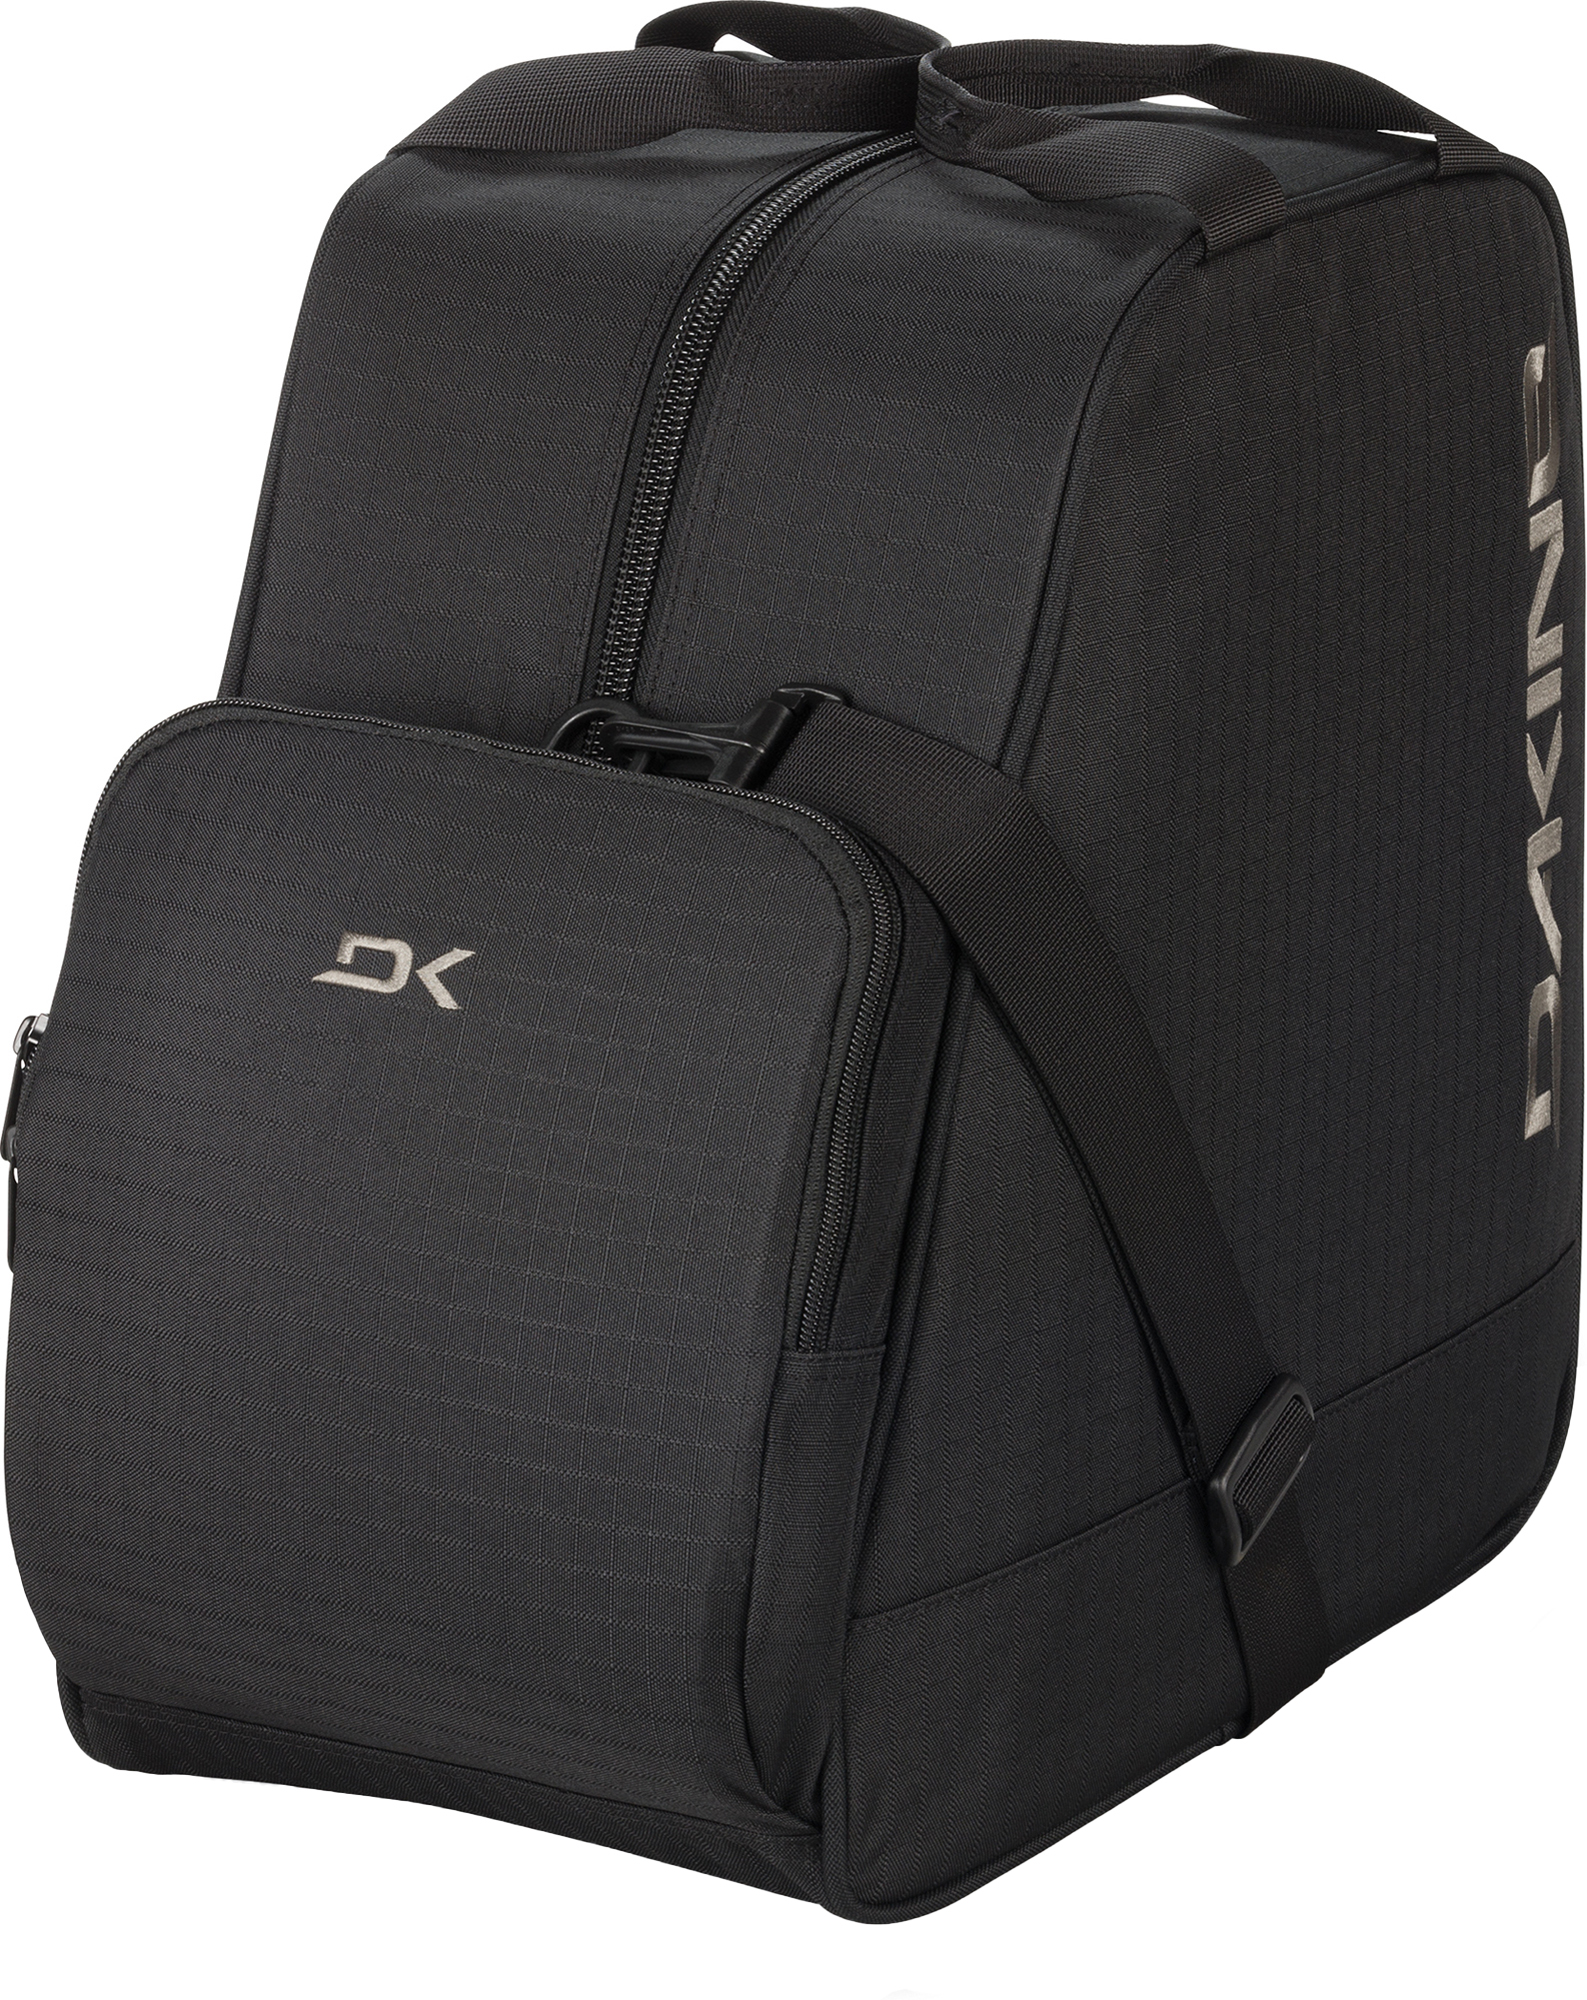 Фото - Dakine Сумка Dakine BOOT BAG, 30 л dakine сумка dakine split roller 110 л